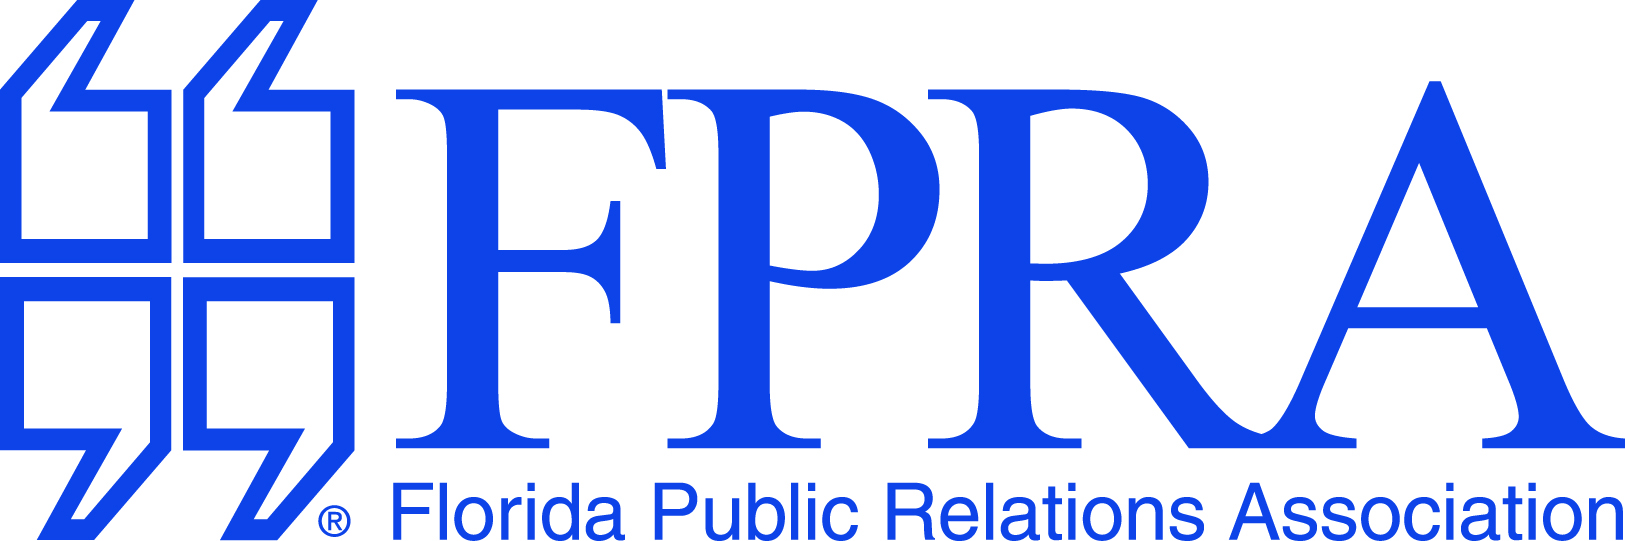 2011-FPRA-Logo-Blue.jpg